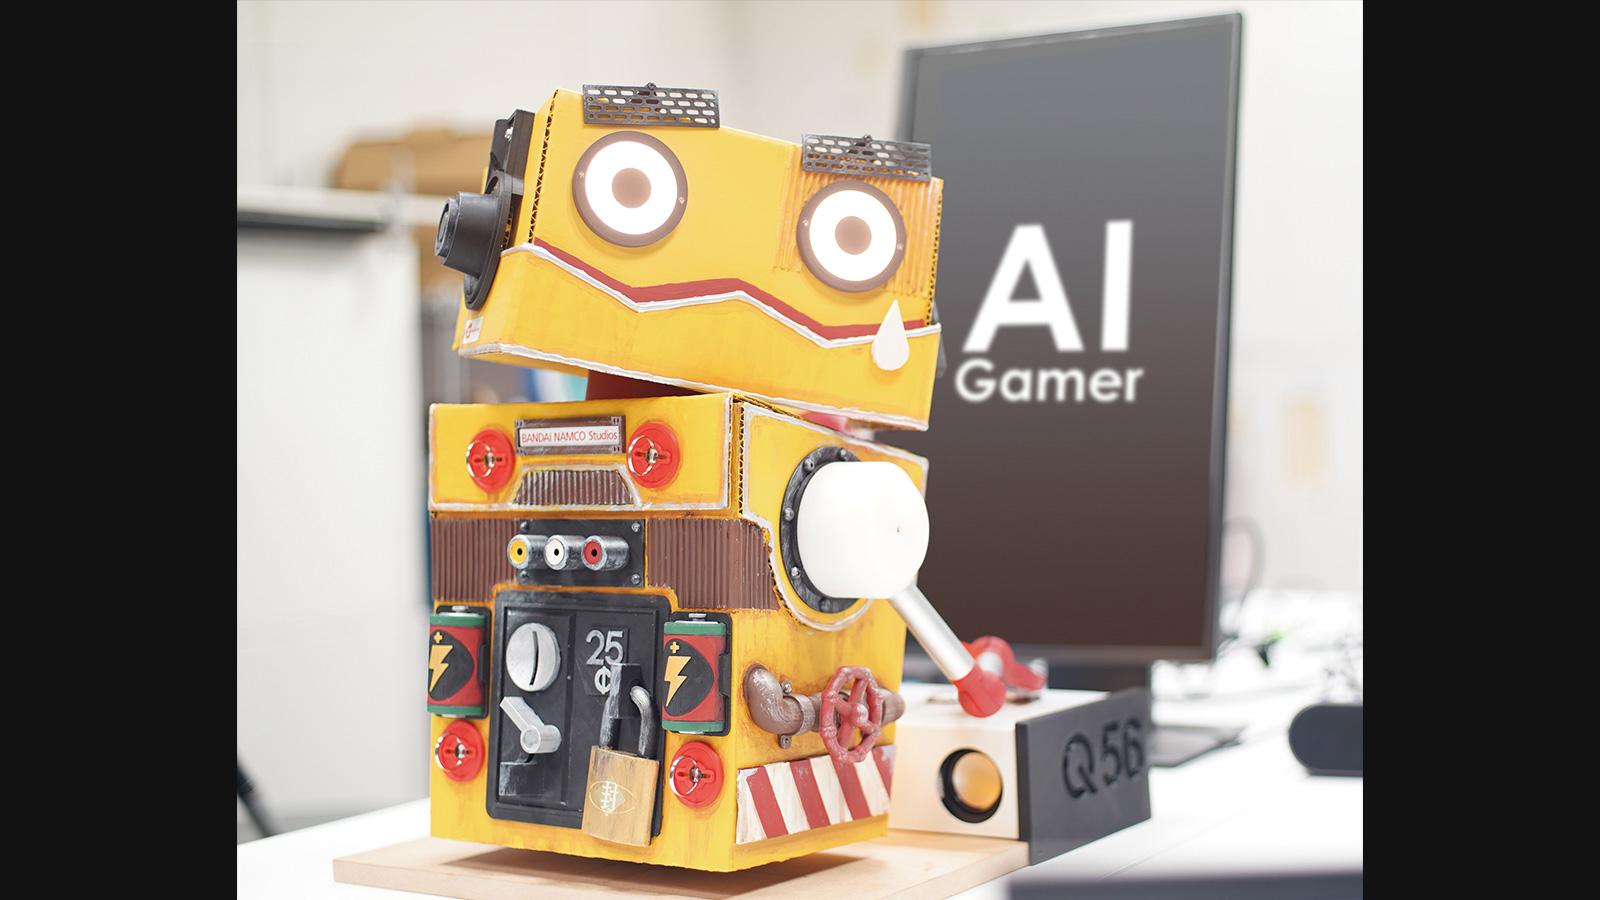 The AI Gamer